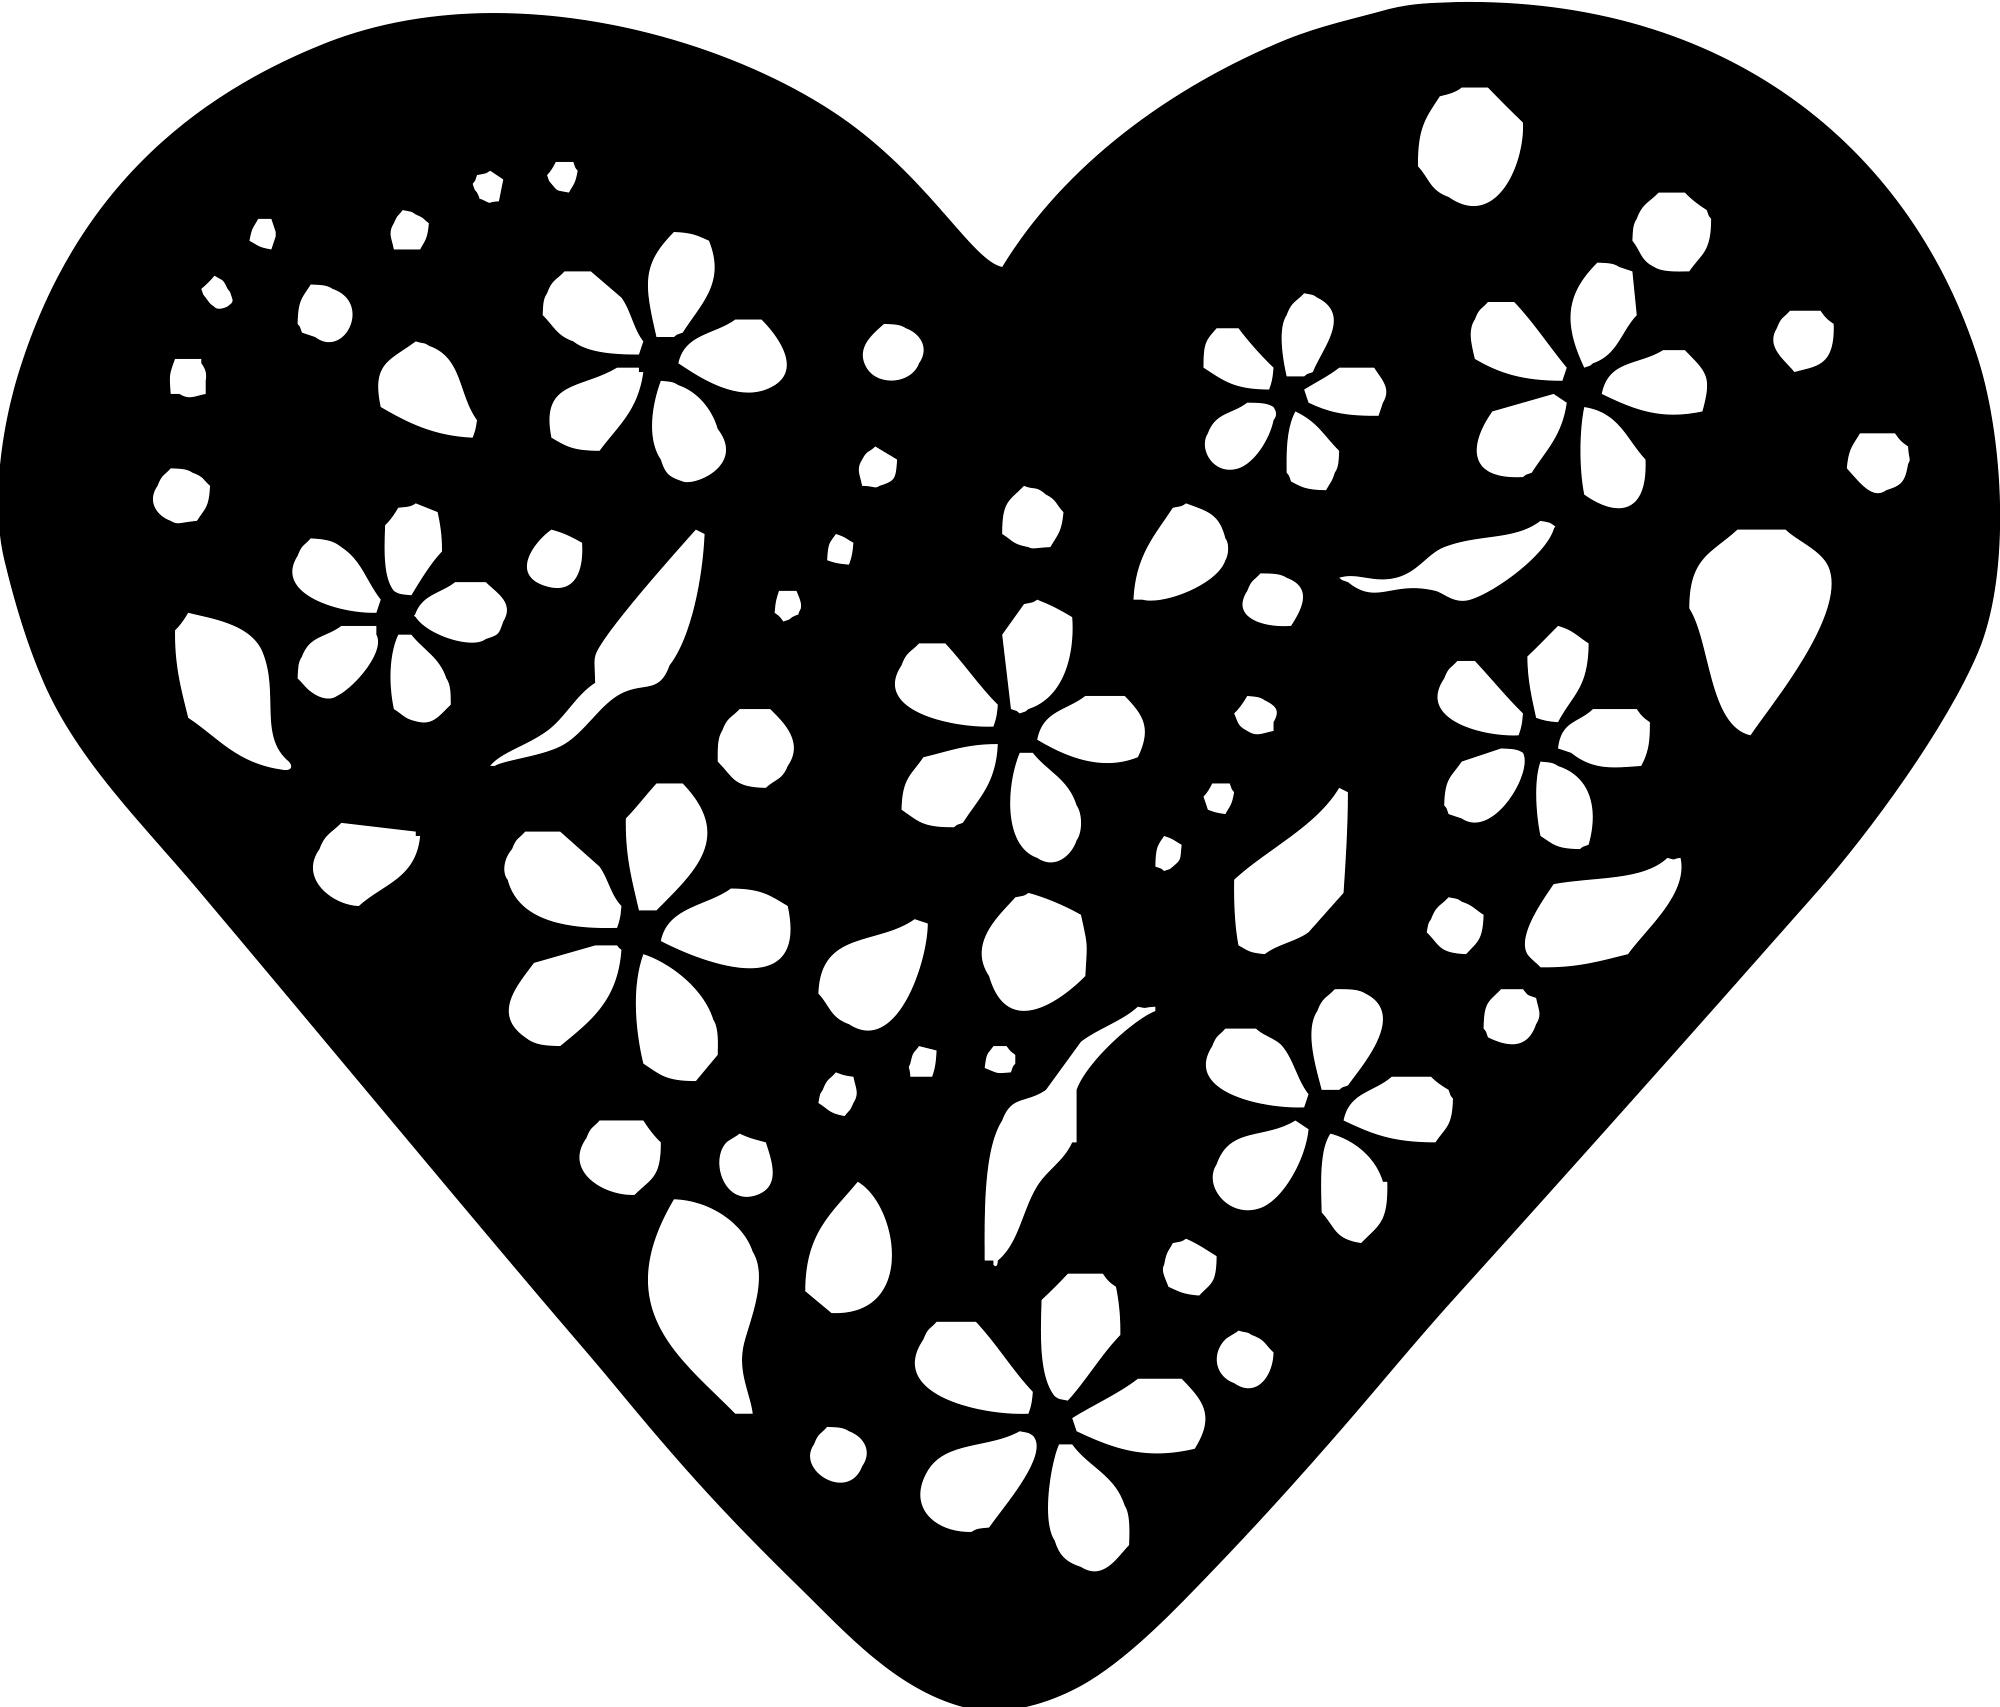 heart pictures gray heart clip art at clkercom vector clip art online pictures heart